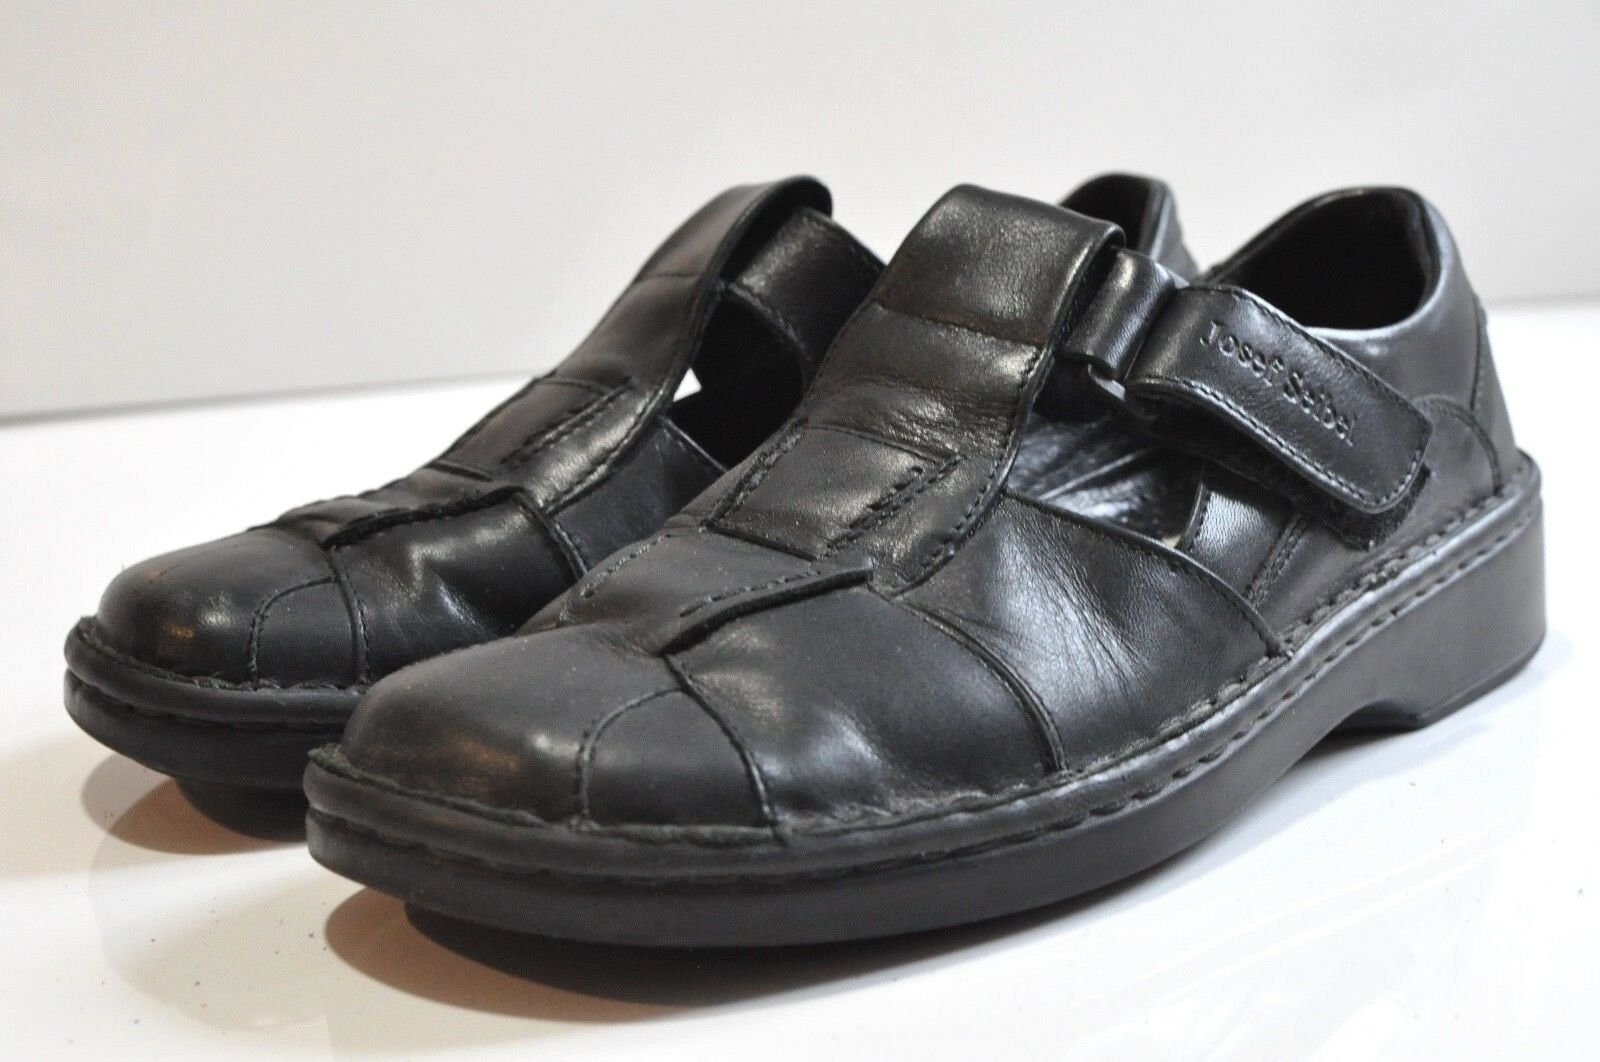 Josef Seibel Damenschuhe Leder Sandalee schuhe Größe 38